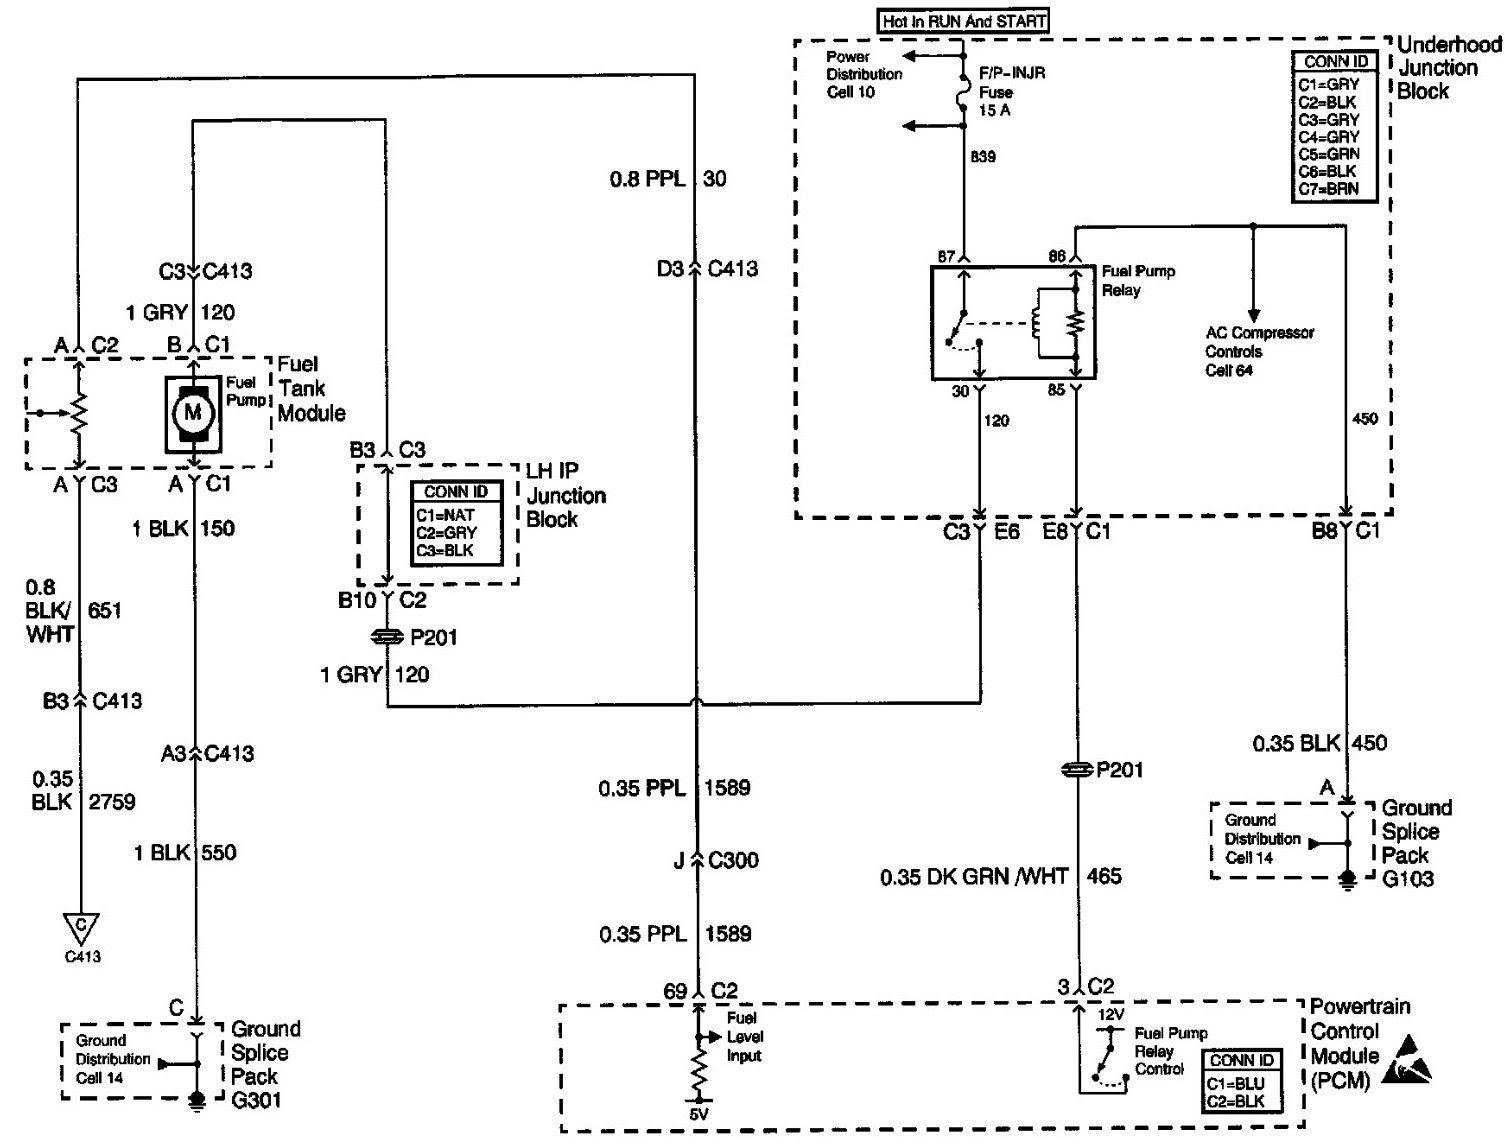 Wiring Diagram 2000 Pontiac Grand Am Wiring Diagram Report1 Report1 Maceratadoc It